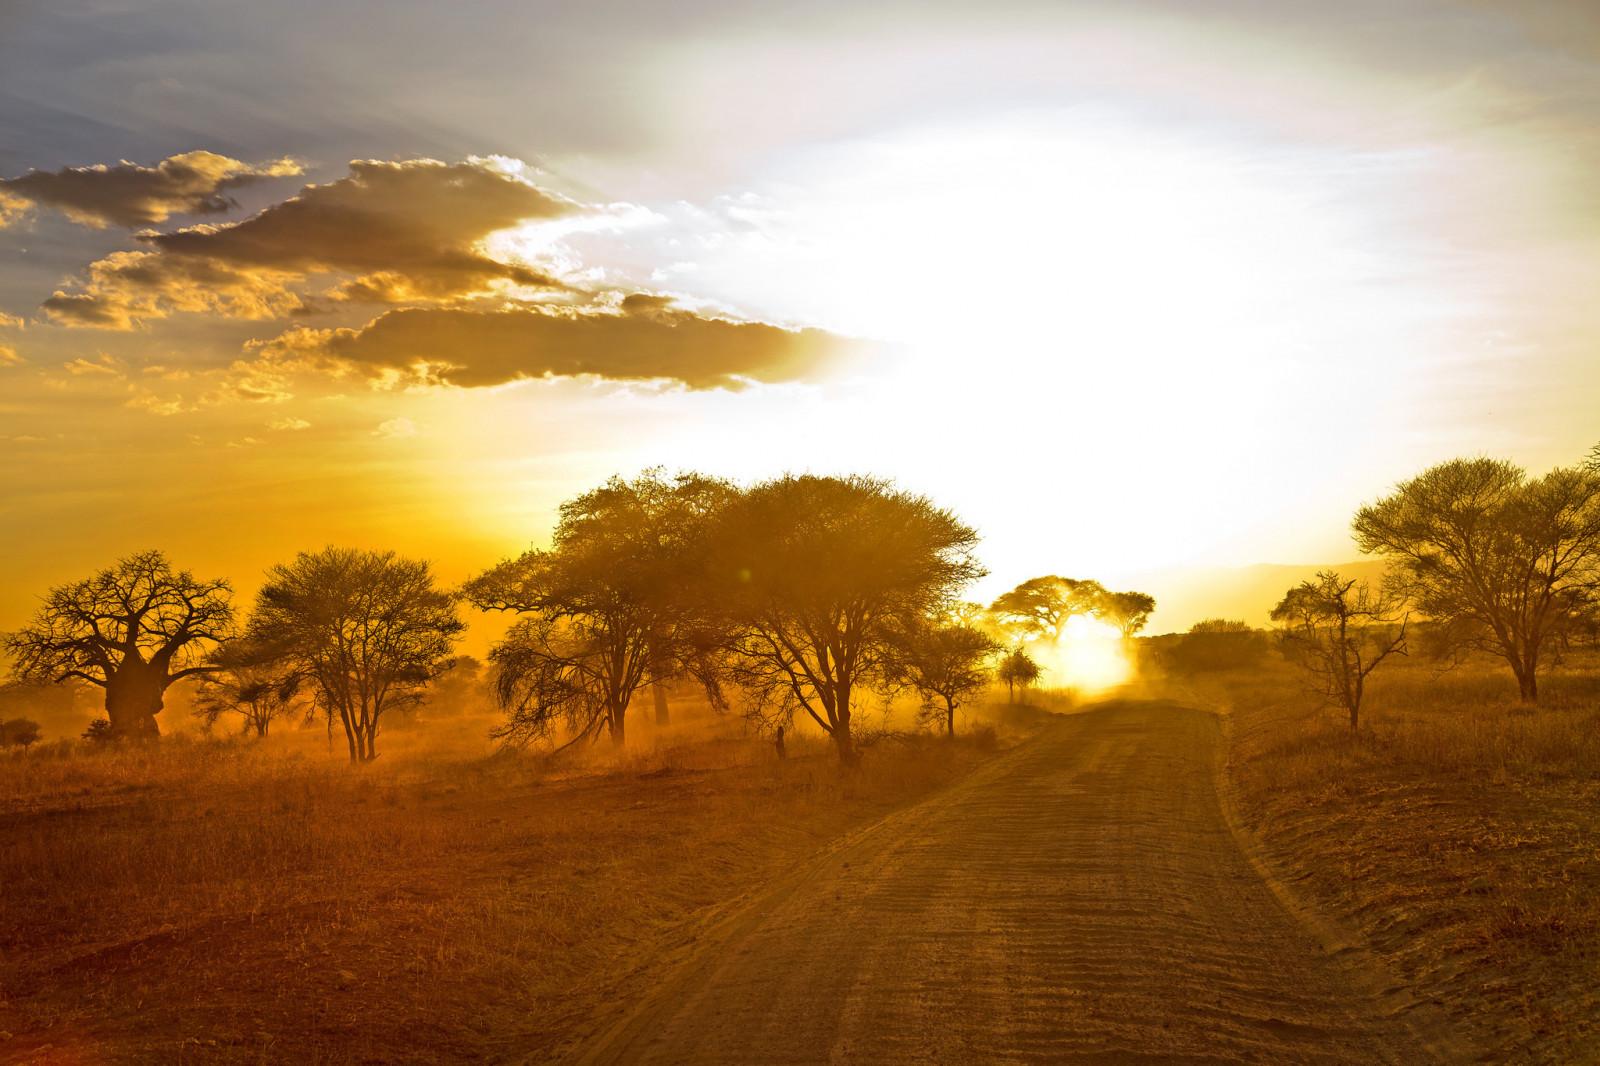 wallpaper   sunlight  trees  landscape  sunset  hill